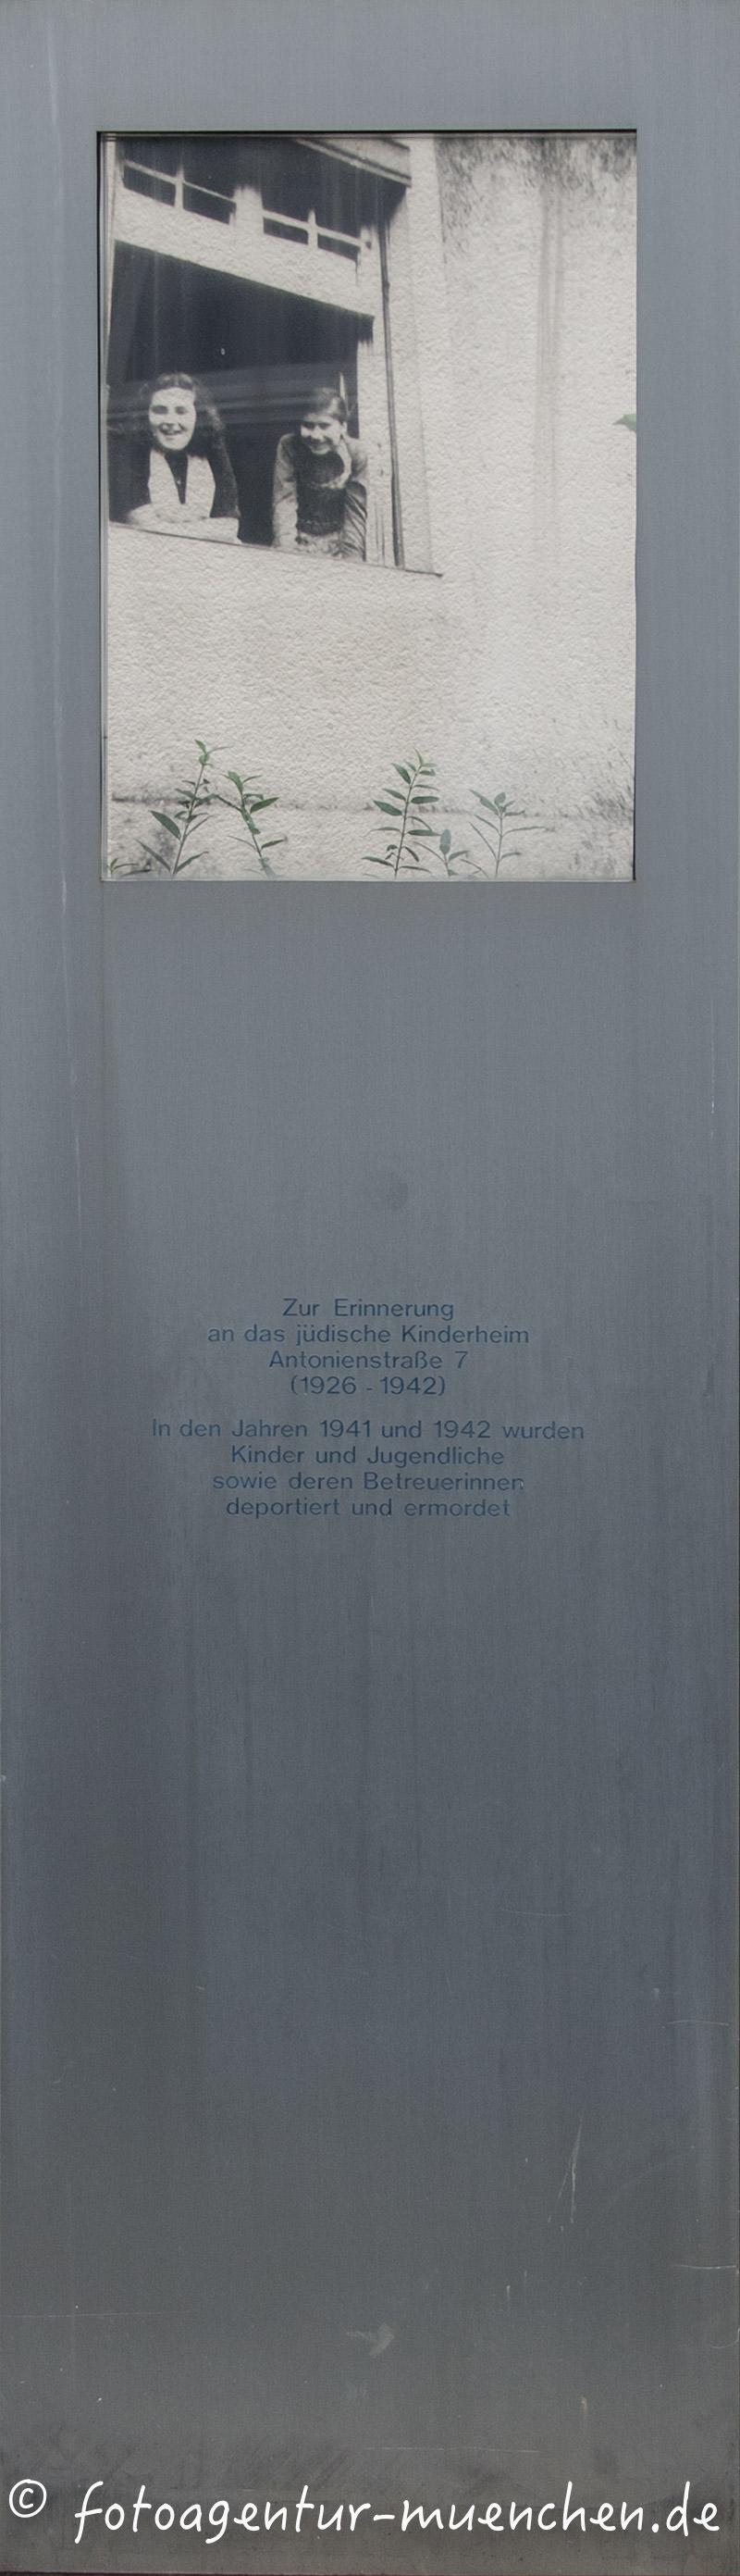 Antonienheim, Kinderheim